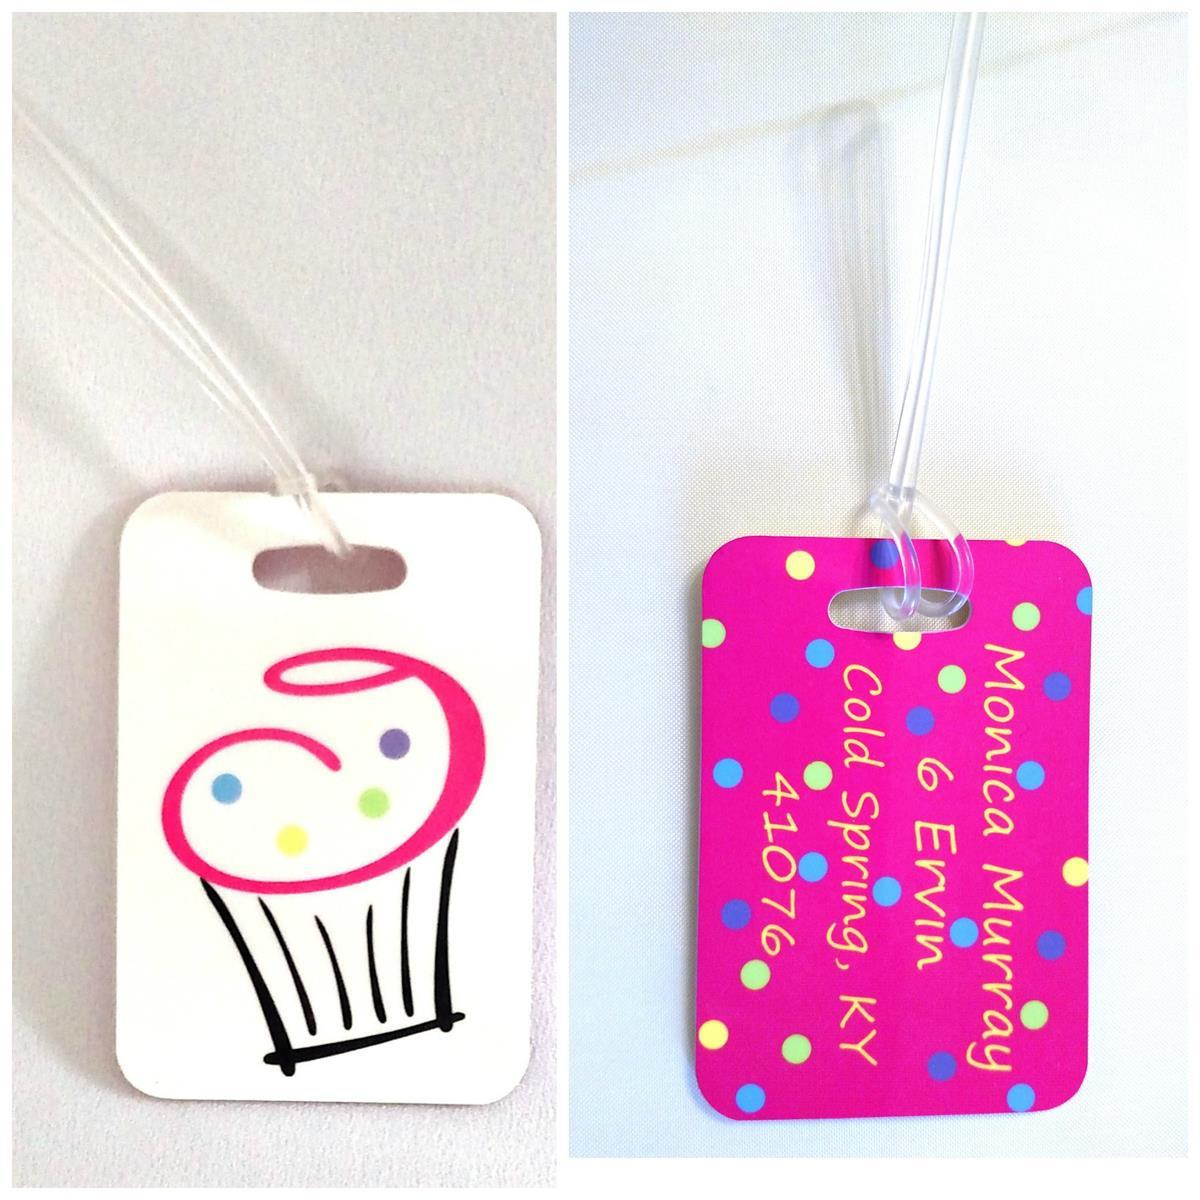 Personalized cupcake bag tag